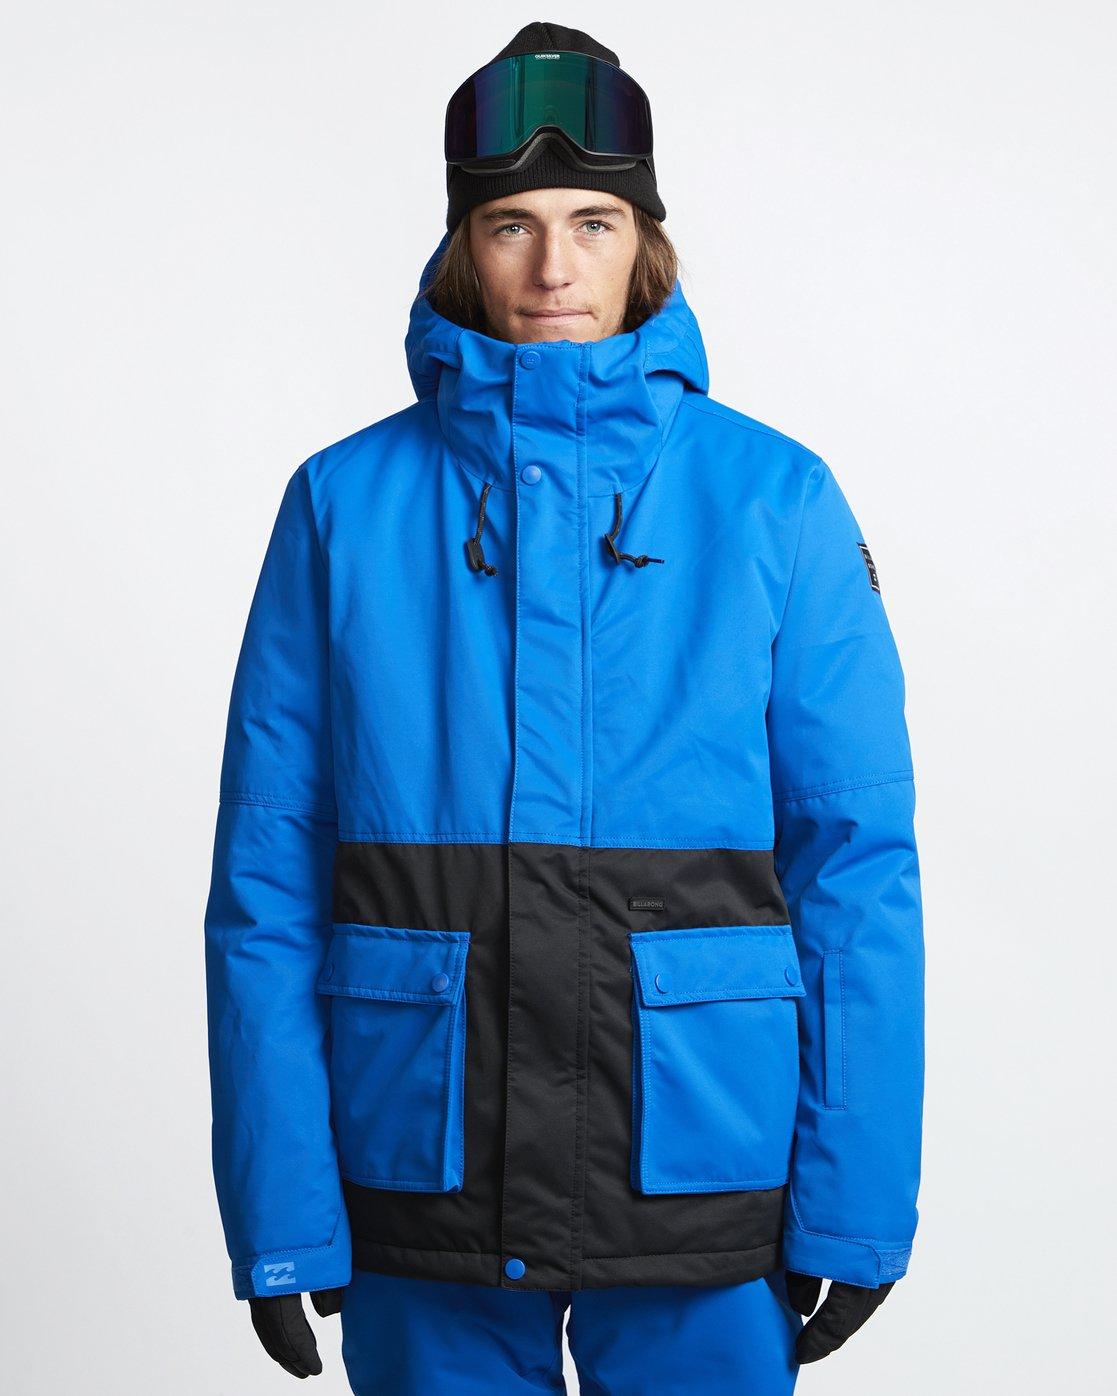 BILLABONG All Day Chaqueta Para Hombre Chaqueta de esqui//snow Hombre